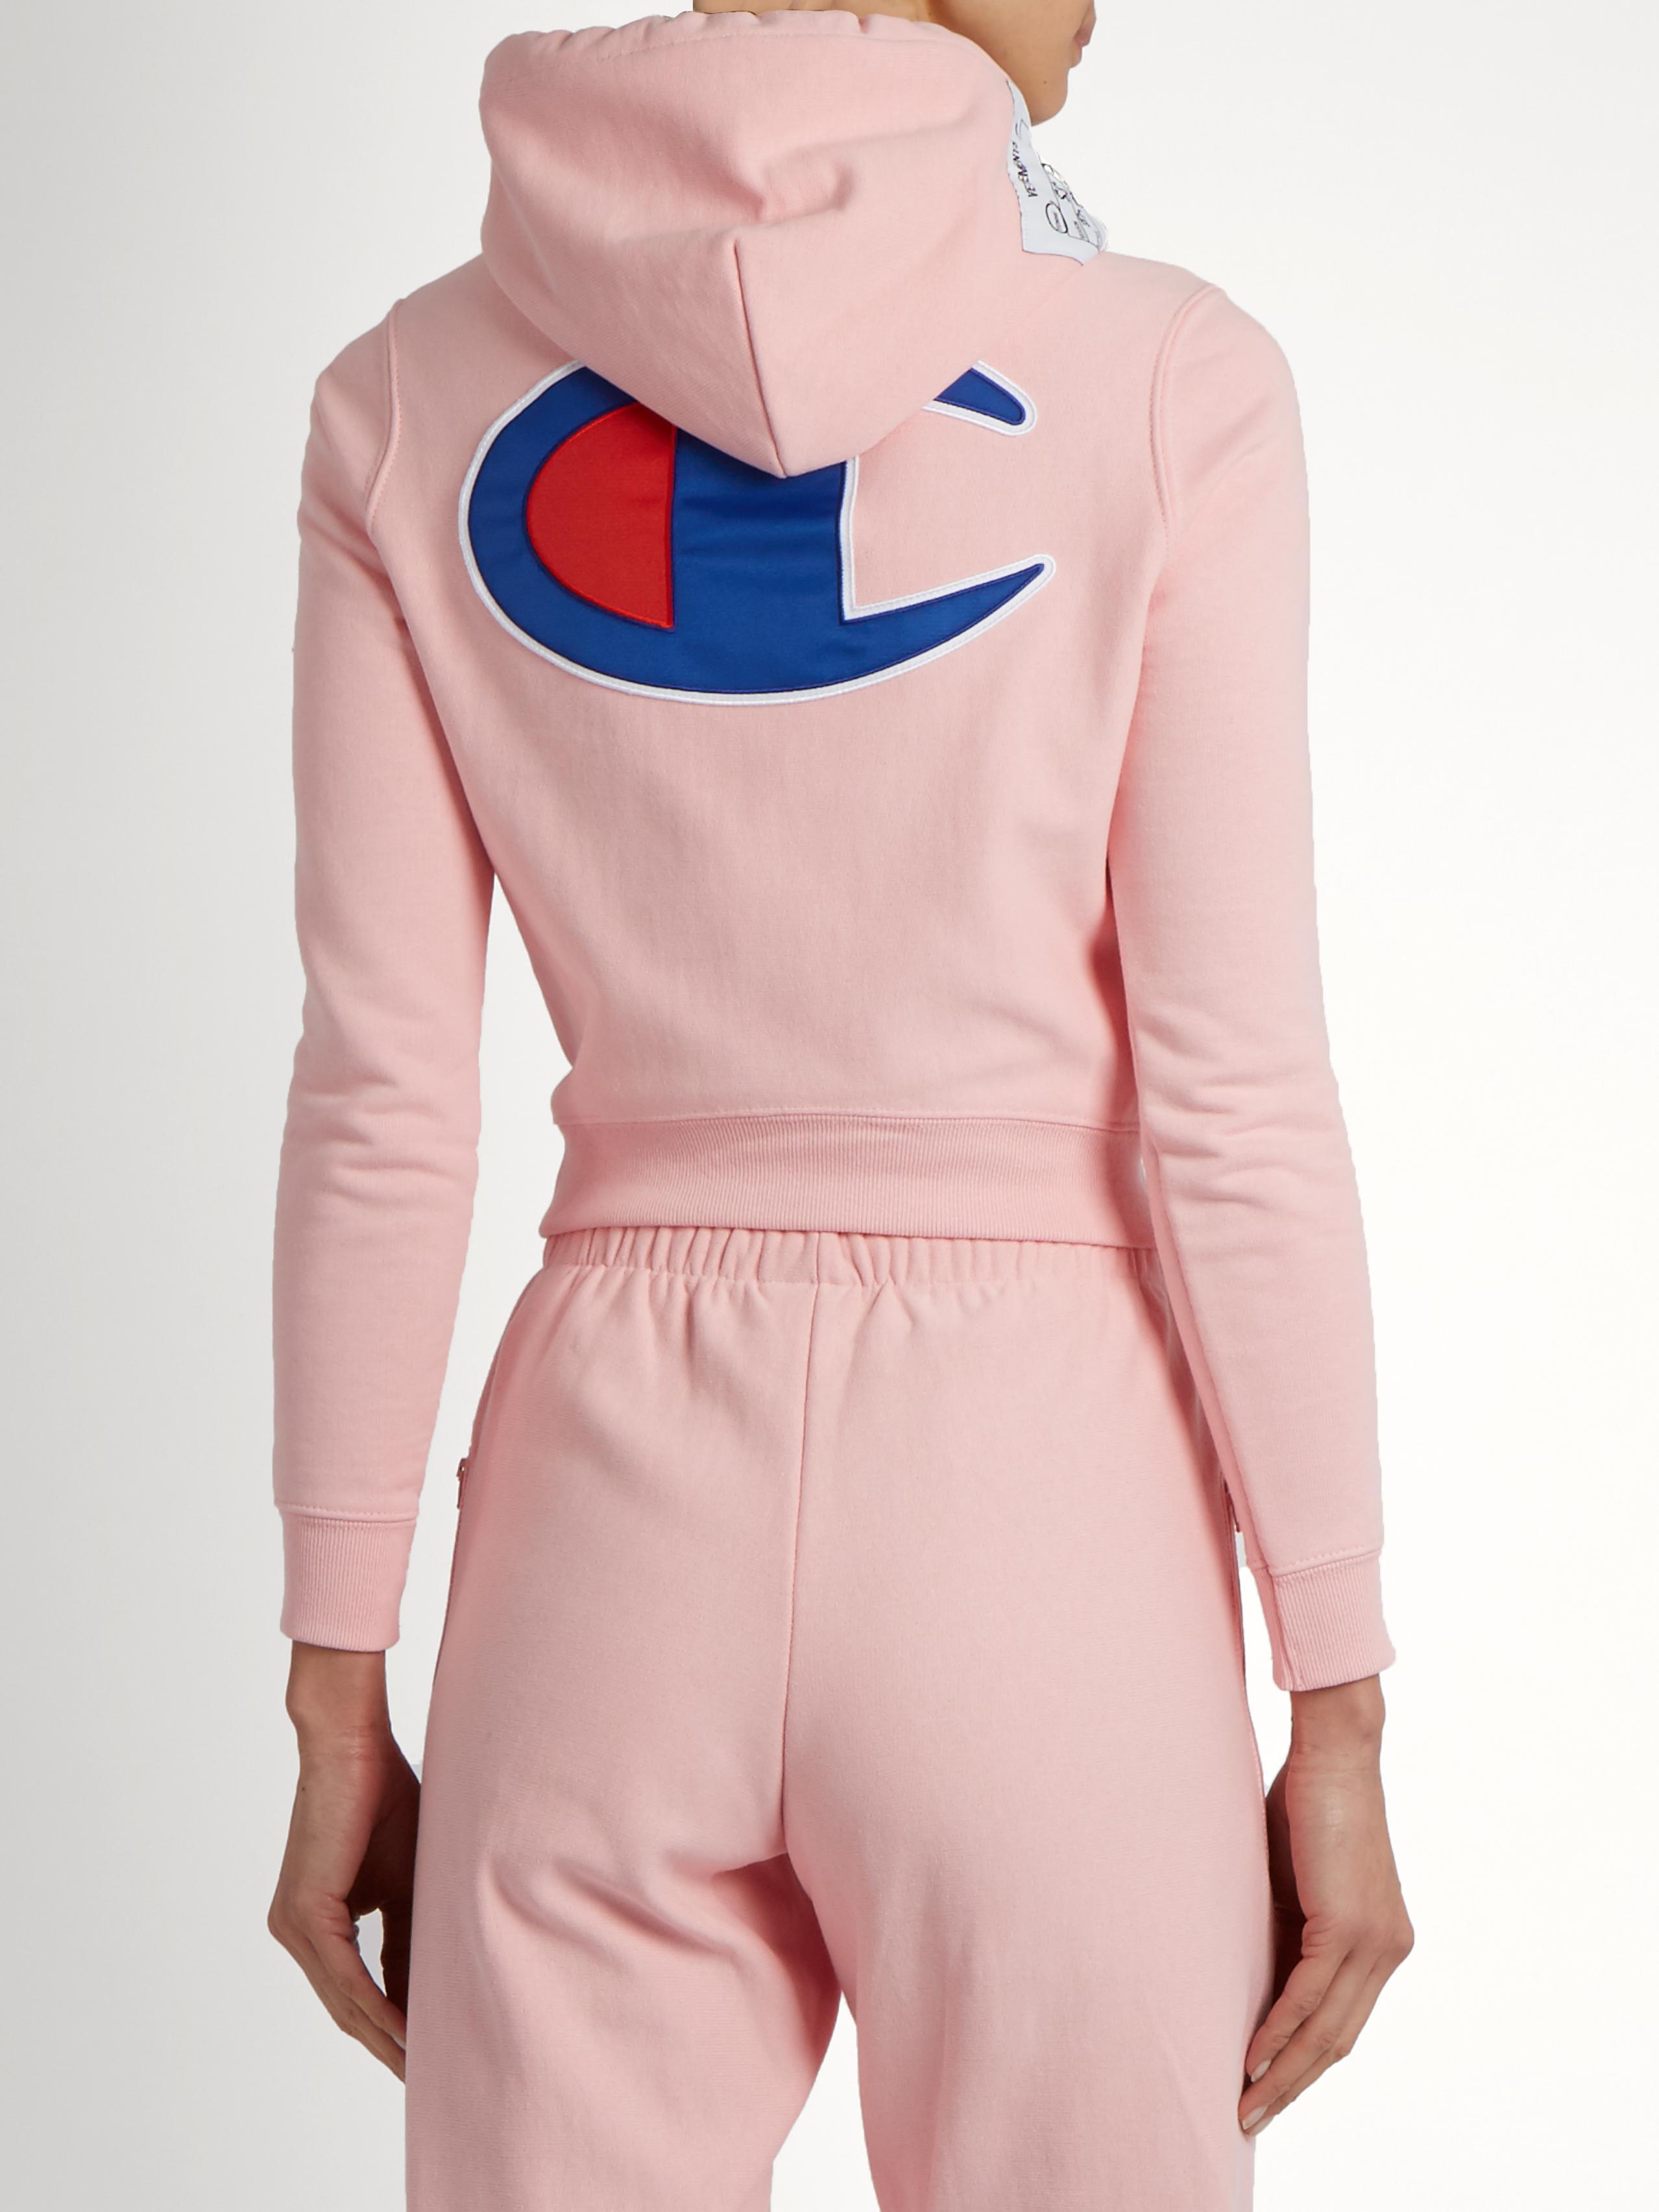 Vetements X Champion Hooded Cotton-blend Sweatshirt in Pink | Lyst